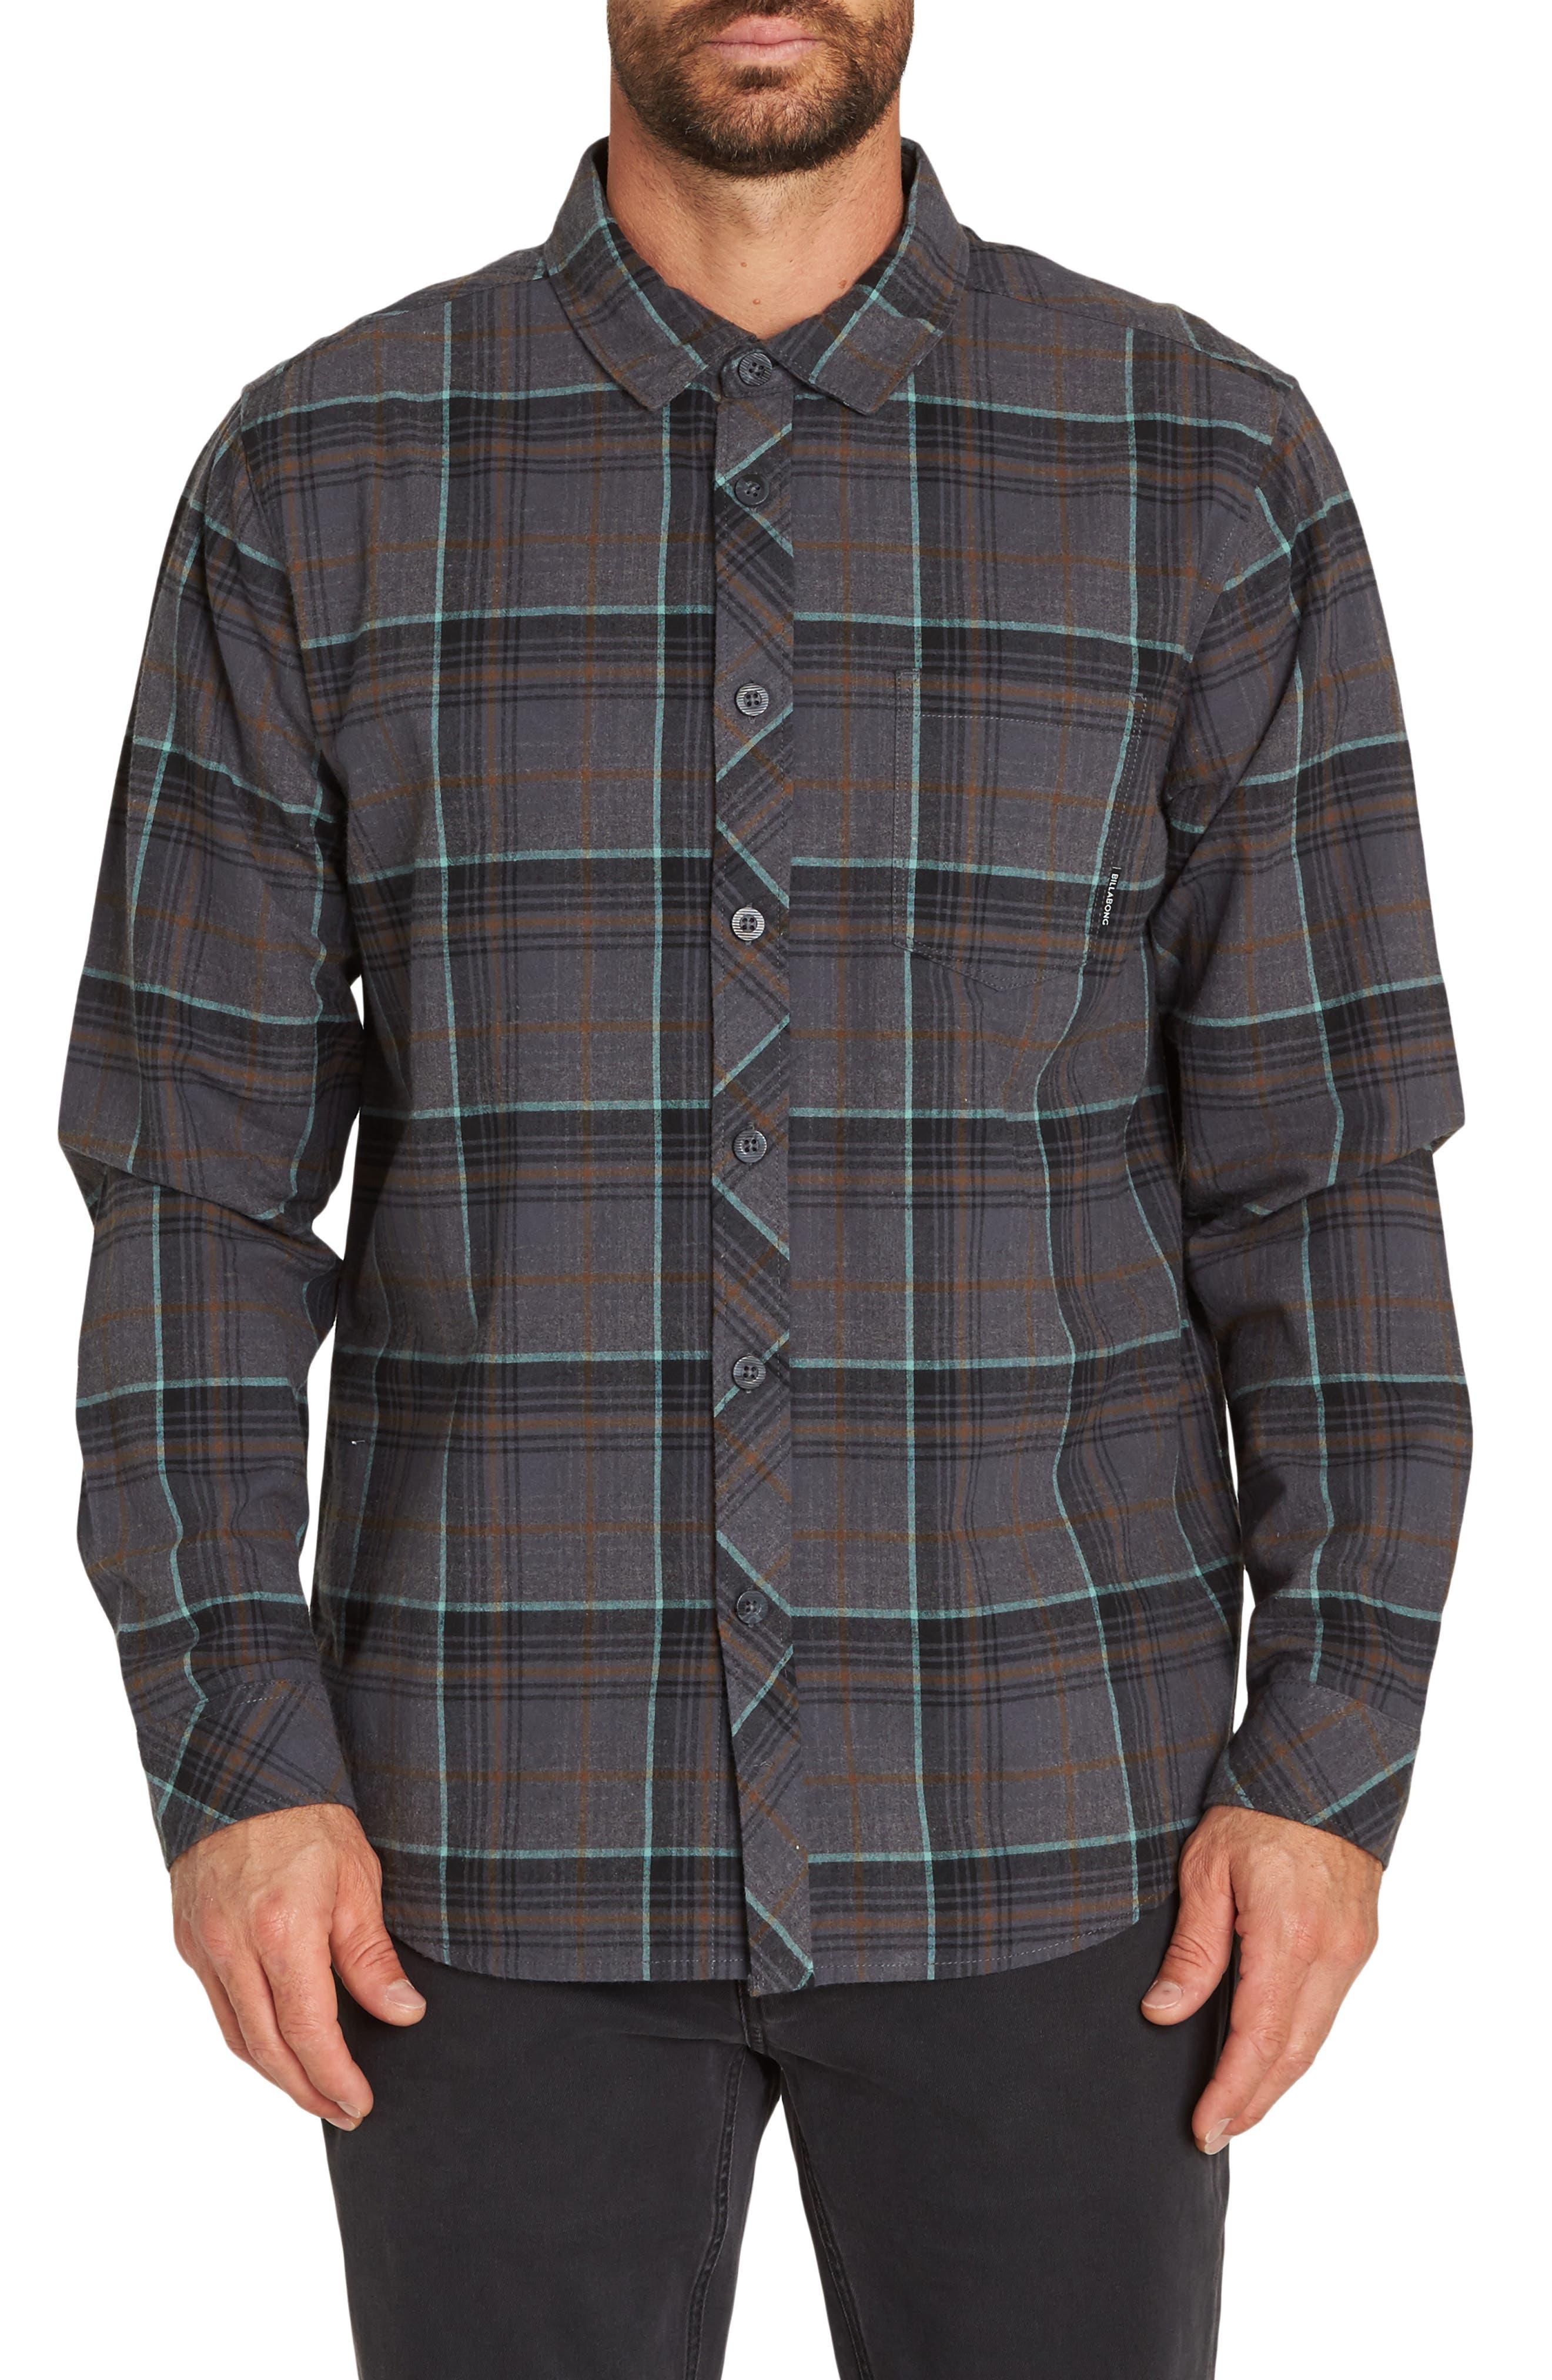 Coastline Plaid Flannel Shirt,                             Main thumbnail 1, color,                             BLACK